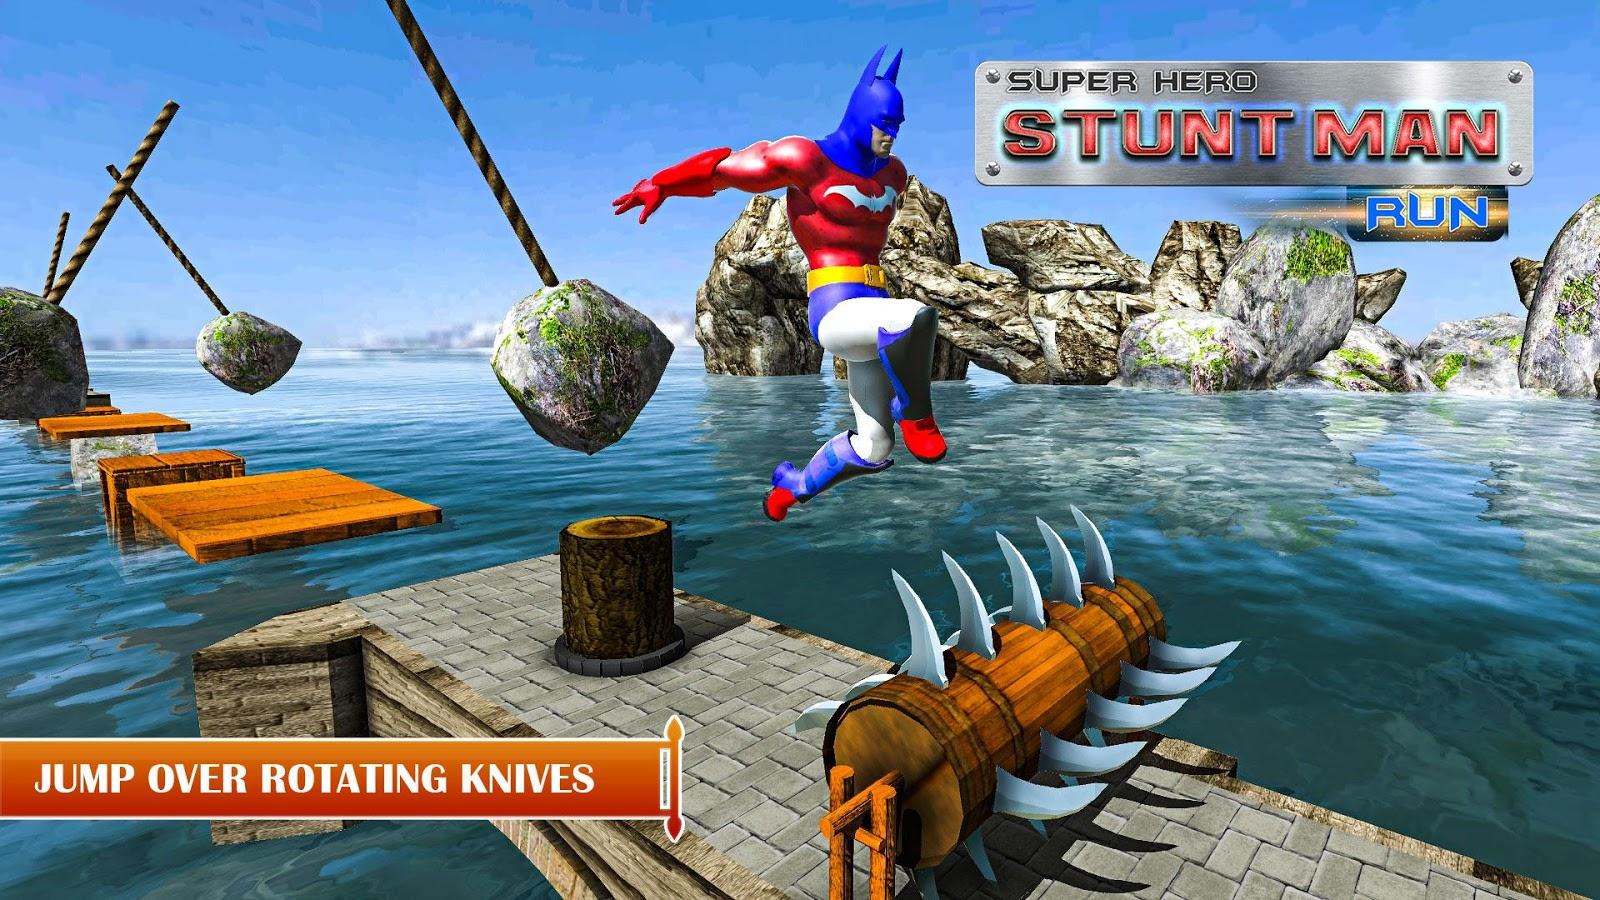 Playpilot Episode 11 Iron Man Vs The Hulk In Roblox Download Superhero Stuntman Run Water Park Games 1 1 3 Apk Android Adventure Games